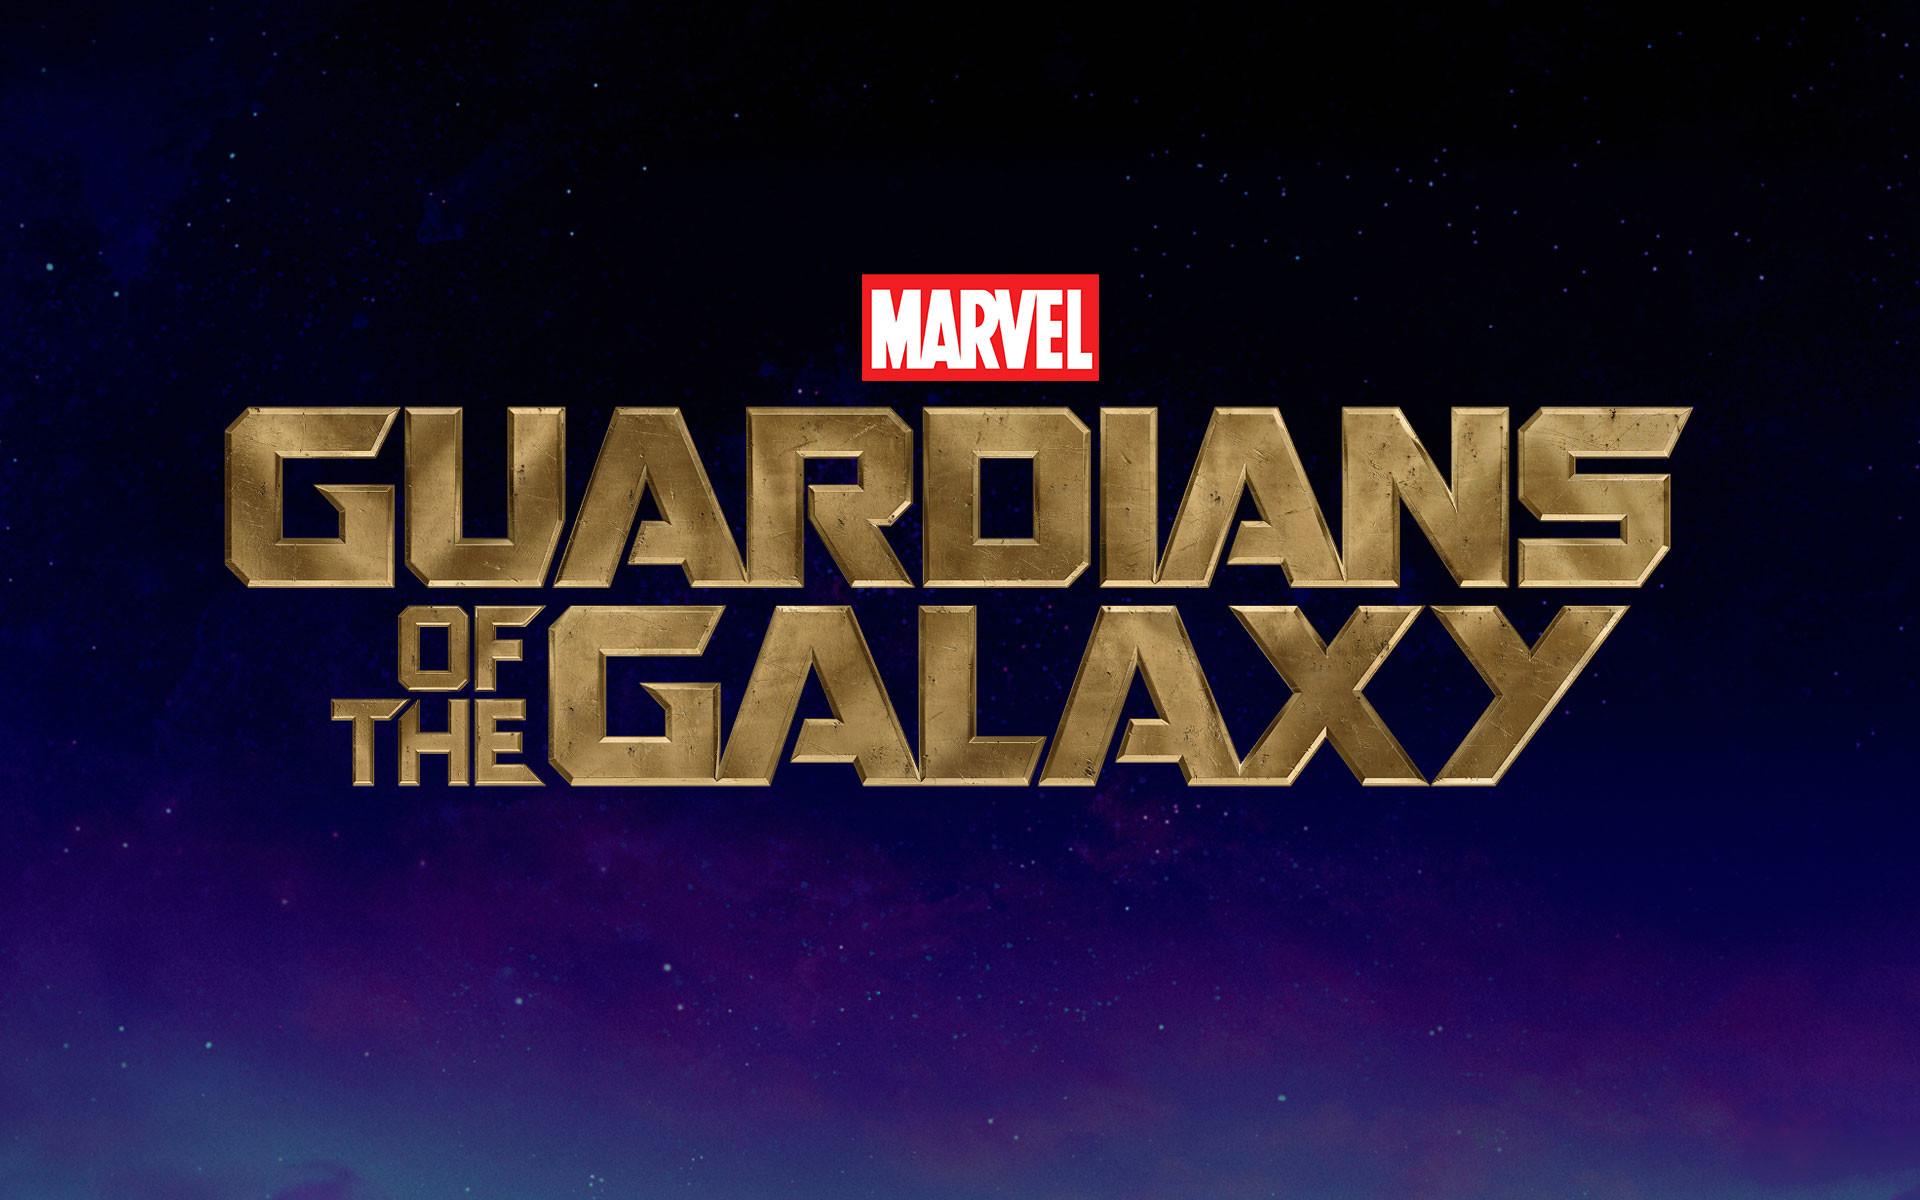 Marvel's Guardians of the Galaxy Logo HD Wallpaper